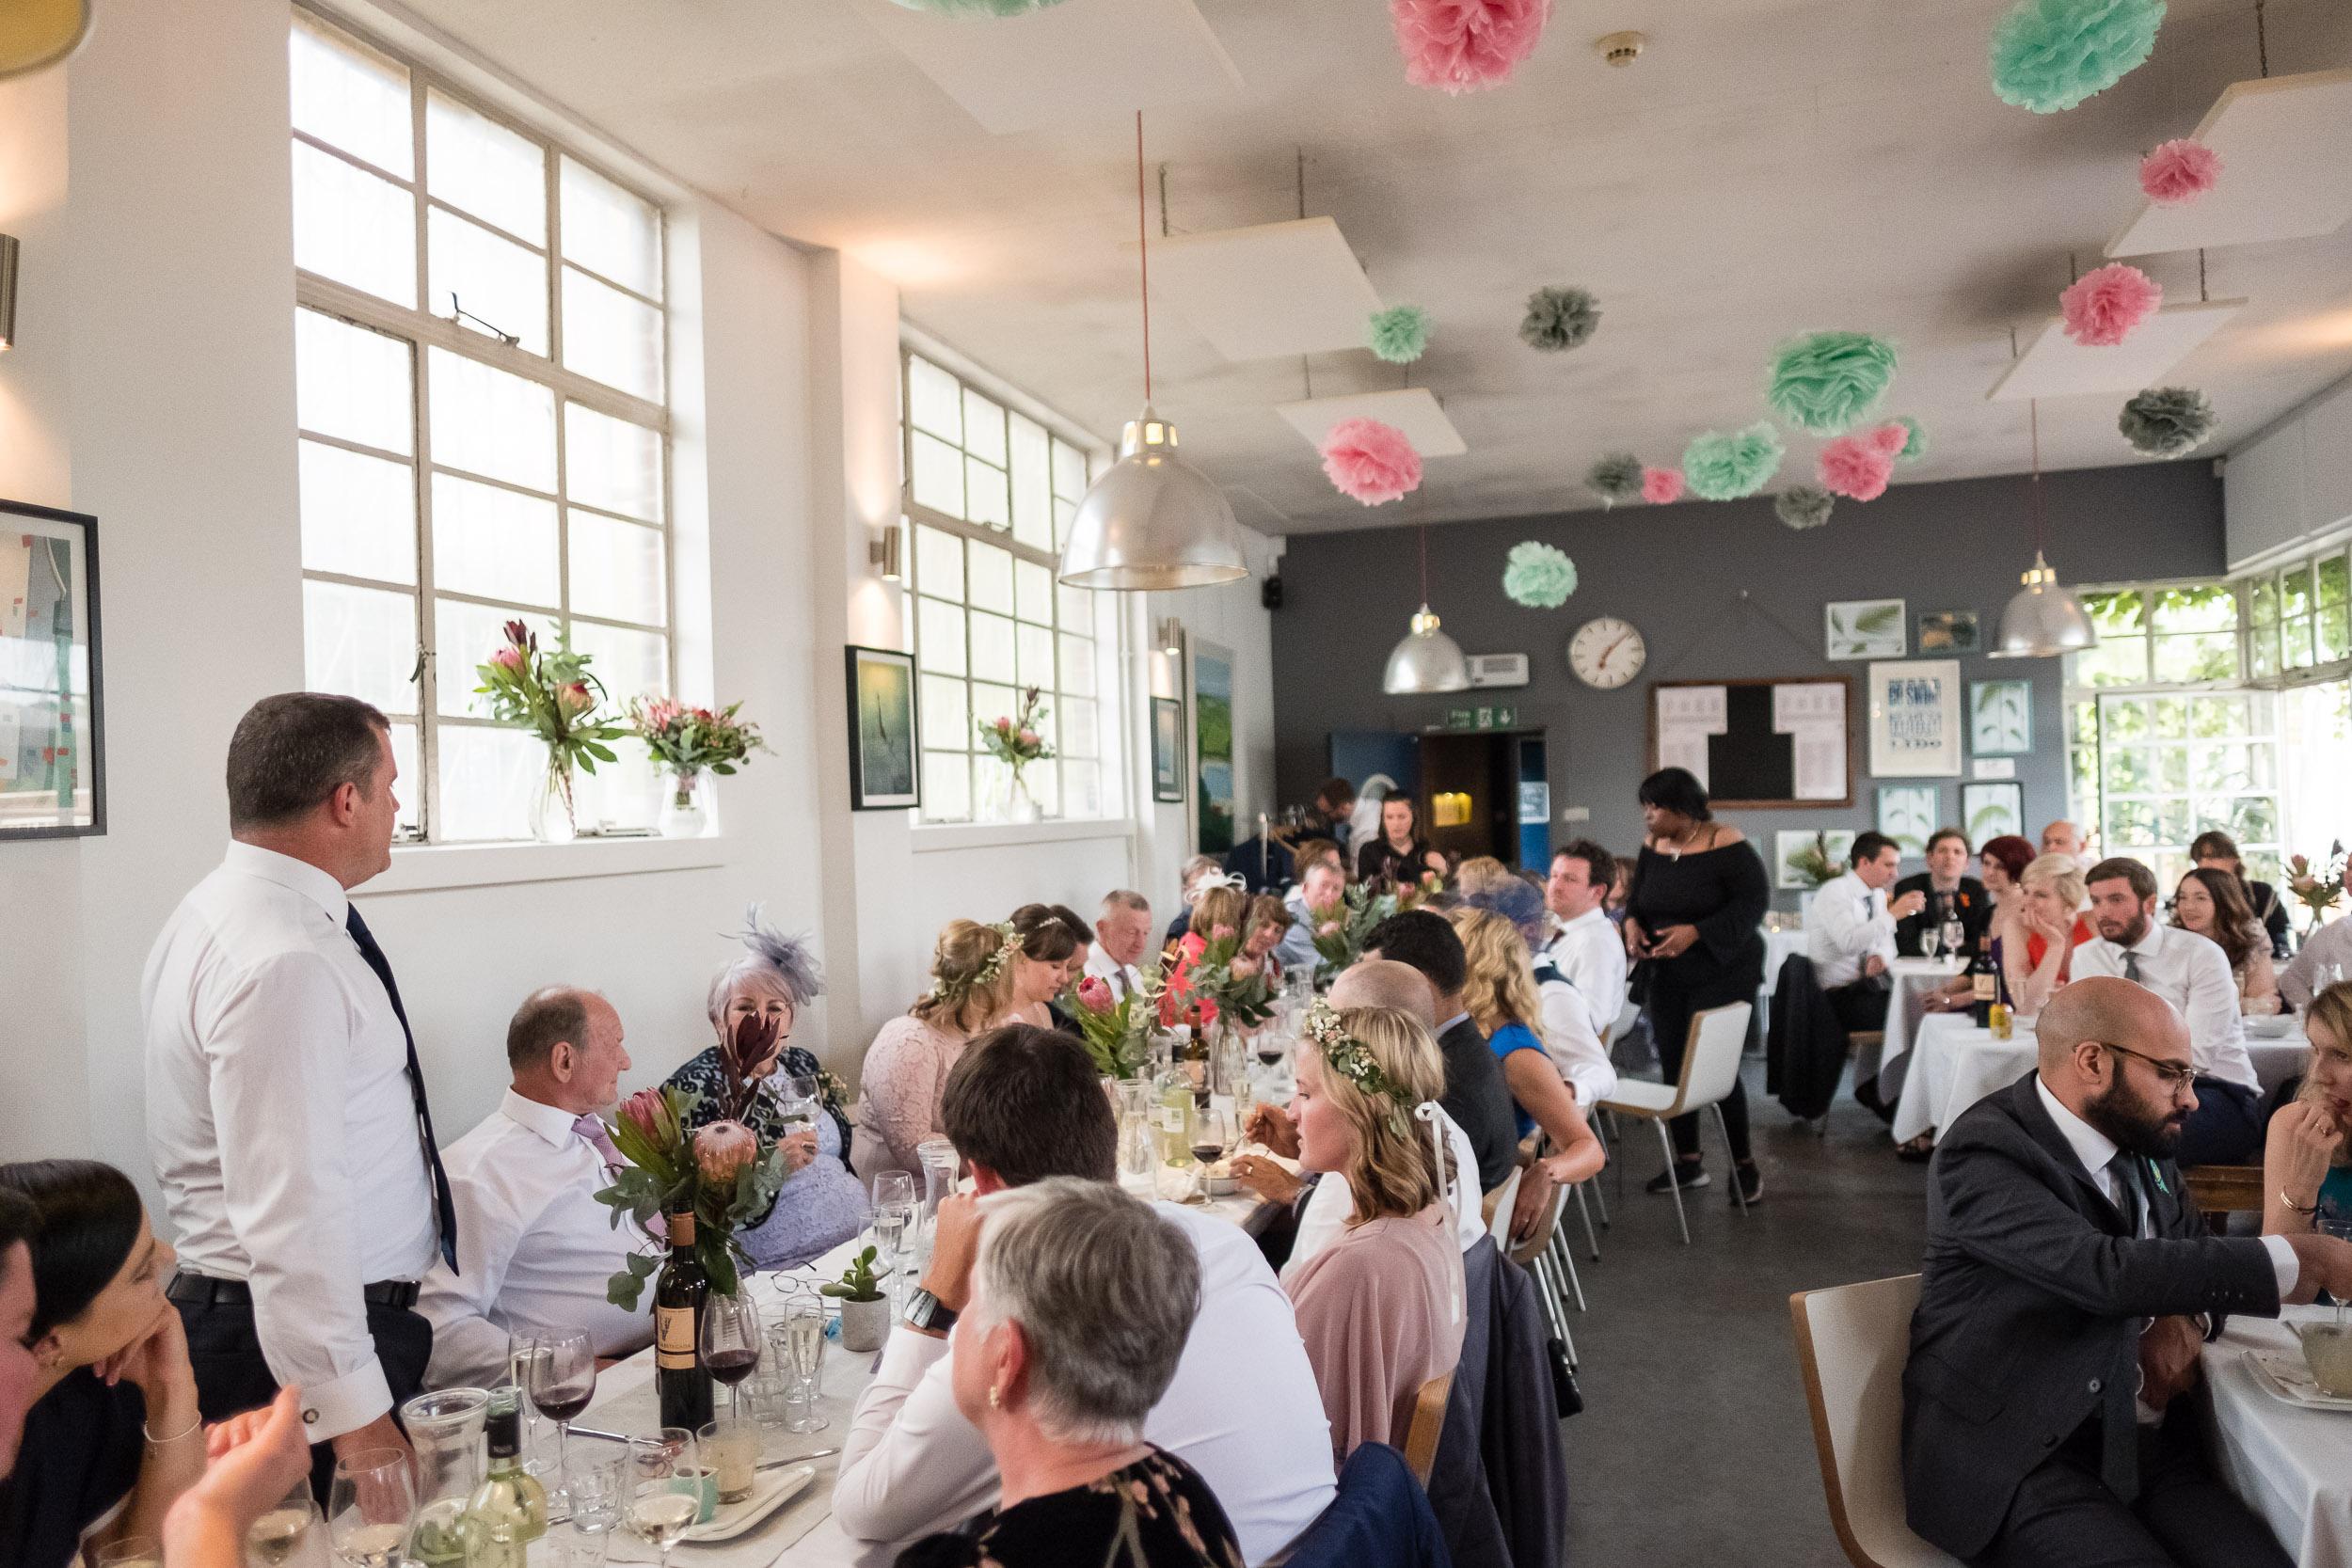 brockwell-lido-brixton-herne-hill-wedding-321.jpg